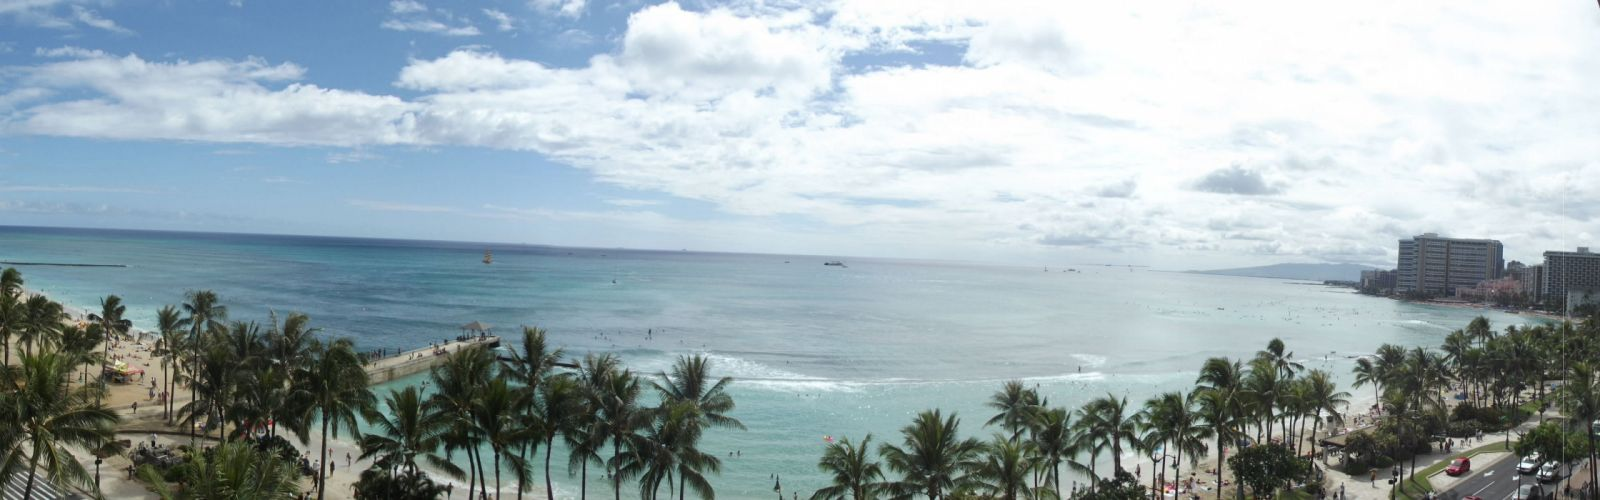 View from Waikiki Beach Hawaii wallpaper